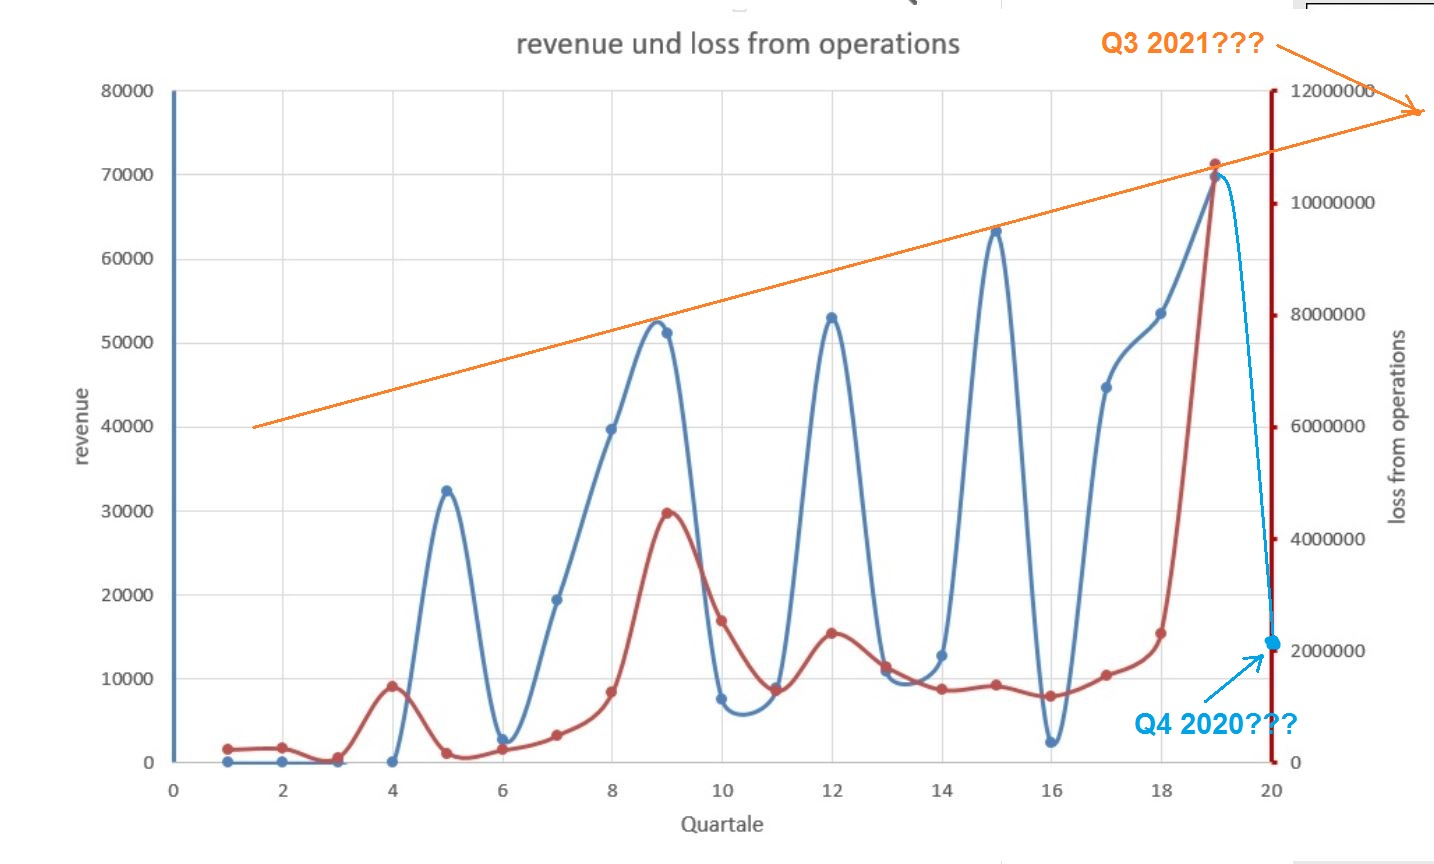 nc_revenue_kurve_m__glich.jpg